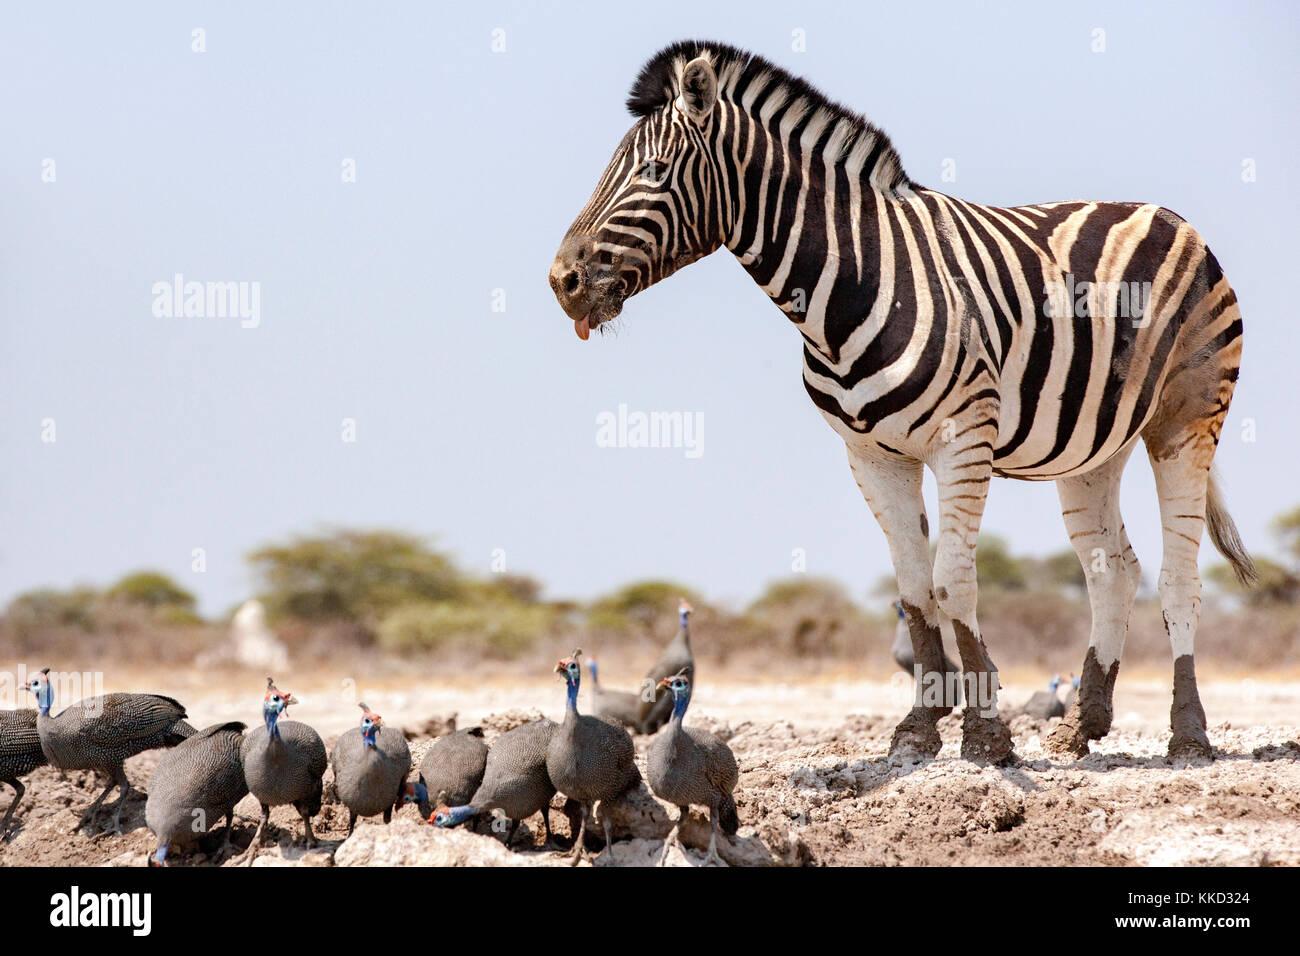 Burchell's zebra (Equus quagga burchellii) - Onkolo Hide, Onguma Game Reserve, Namibia, Africa - Stock Image